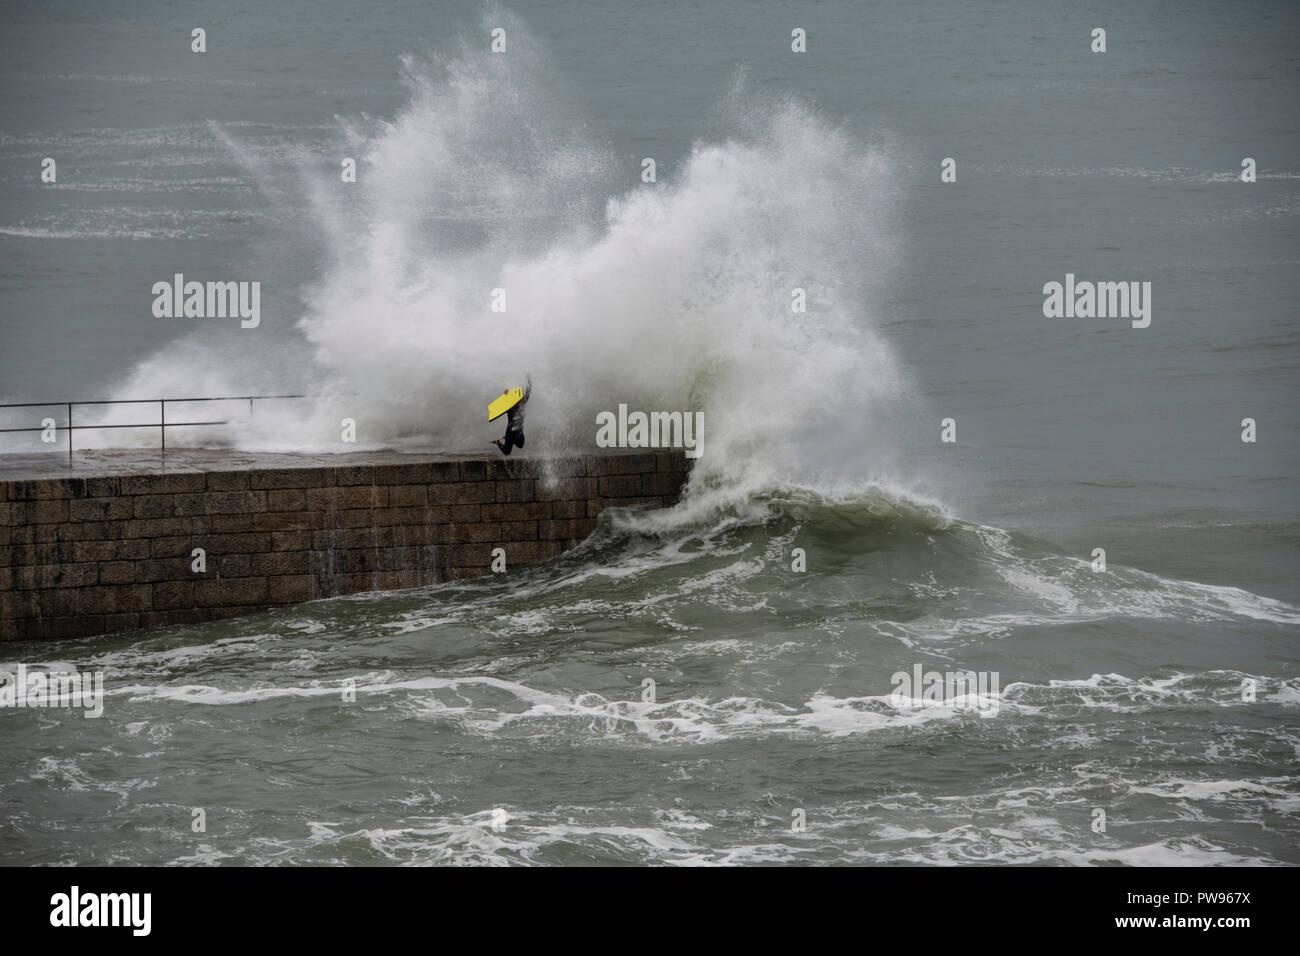 Porthleven, UK. 14th October 2018. Storm Callum porthleven Cornwall still creating large waves at Tye Rock 14-10-2018 Credit: kathleen white/Alamy Live News Stock Photo